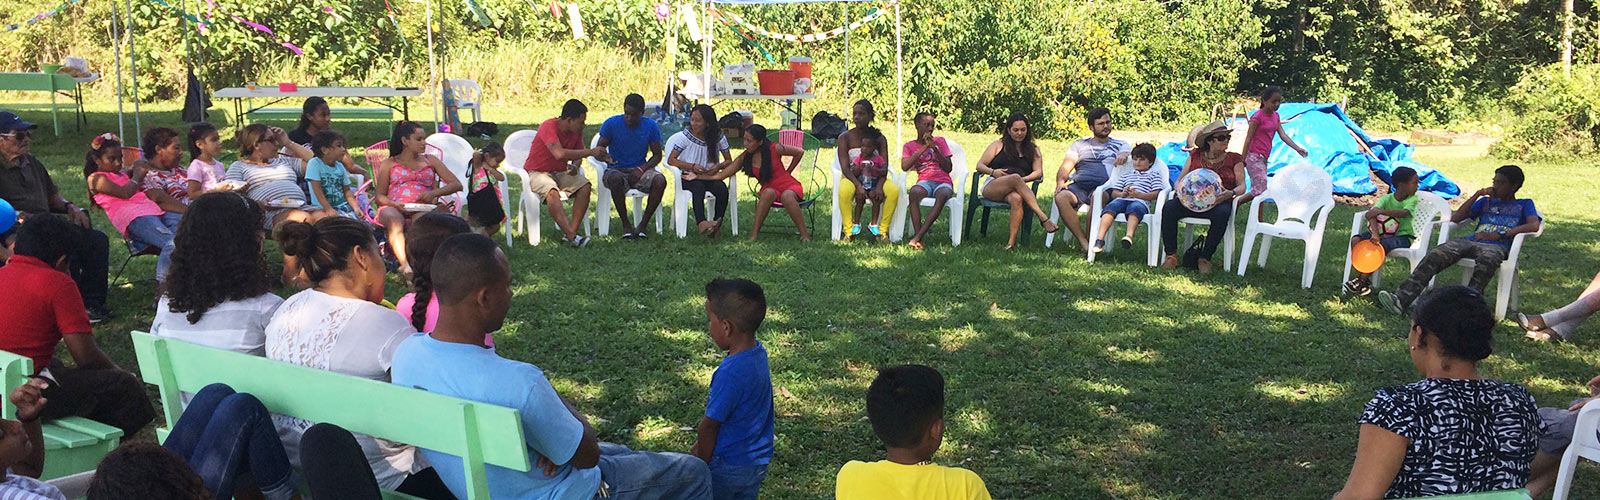 Belize Baha'i